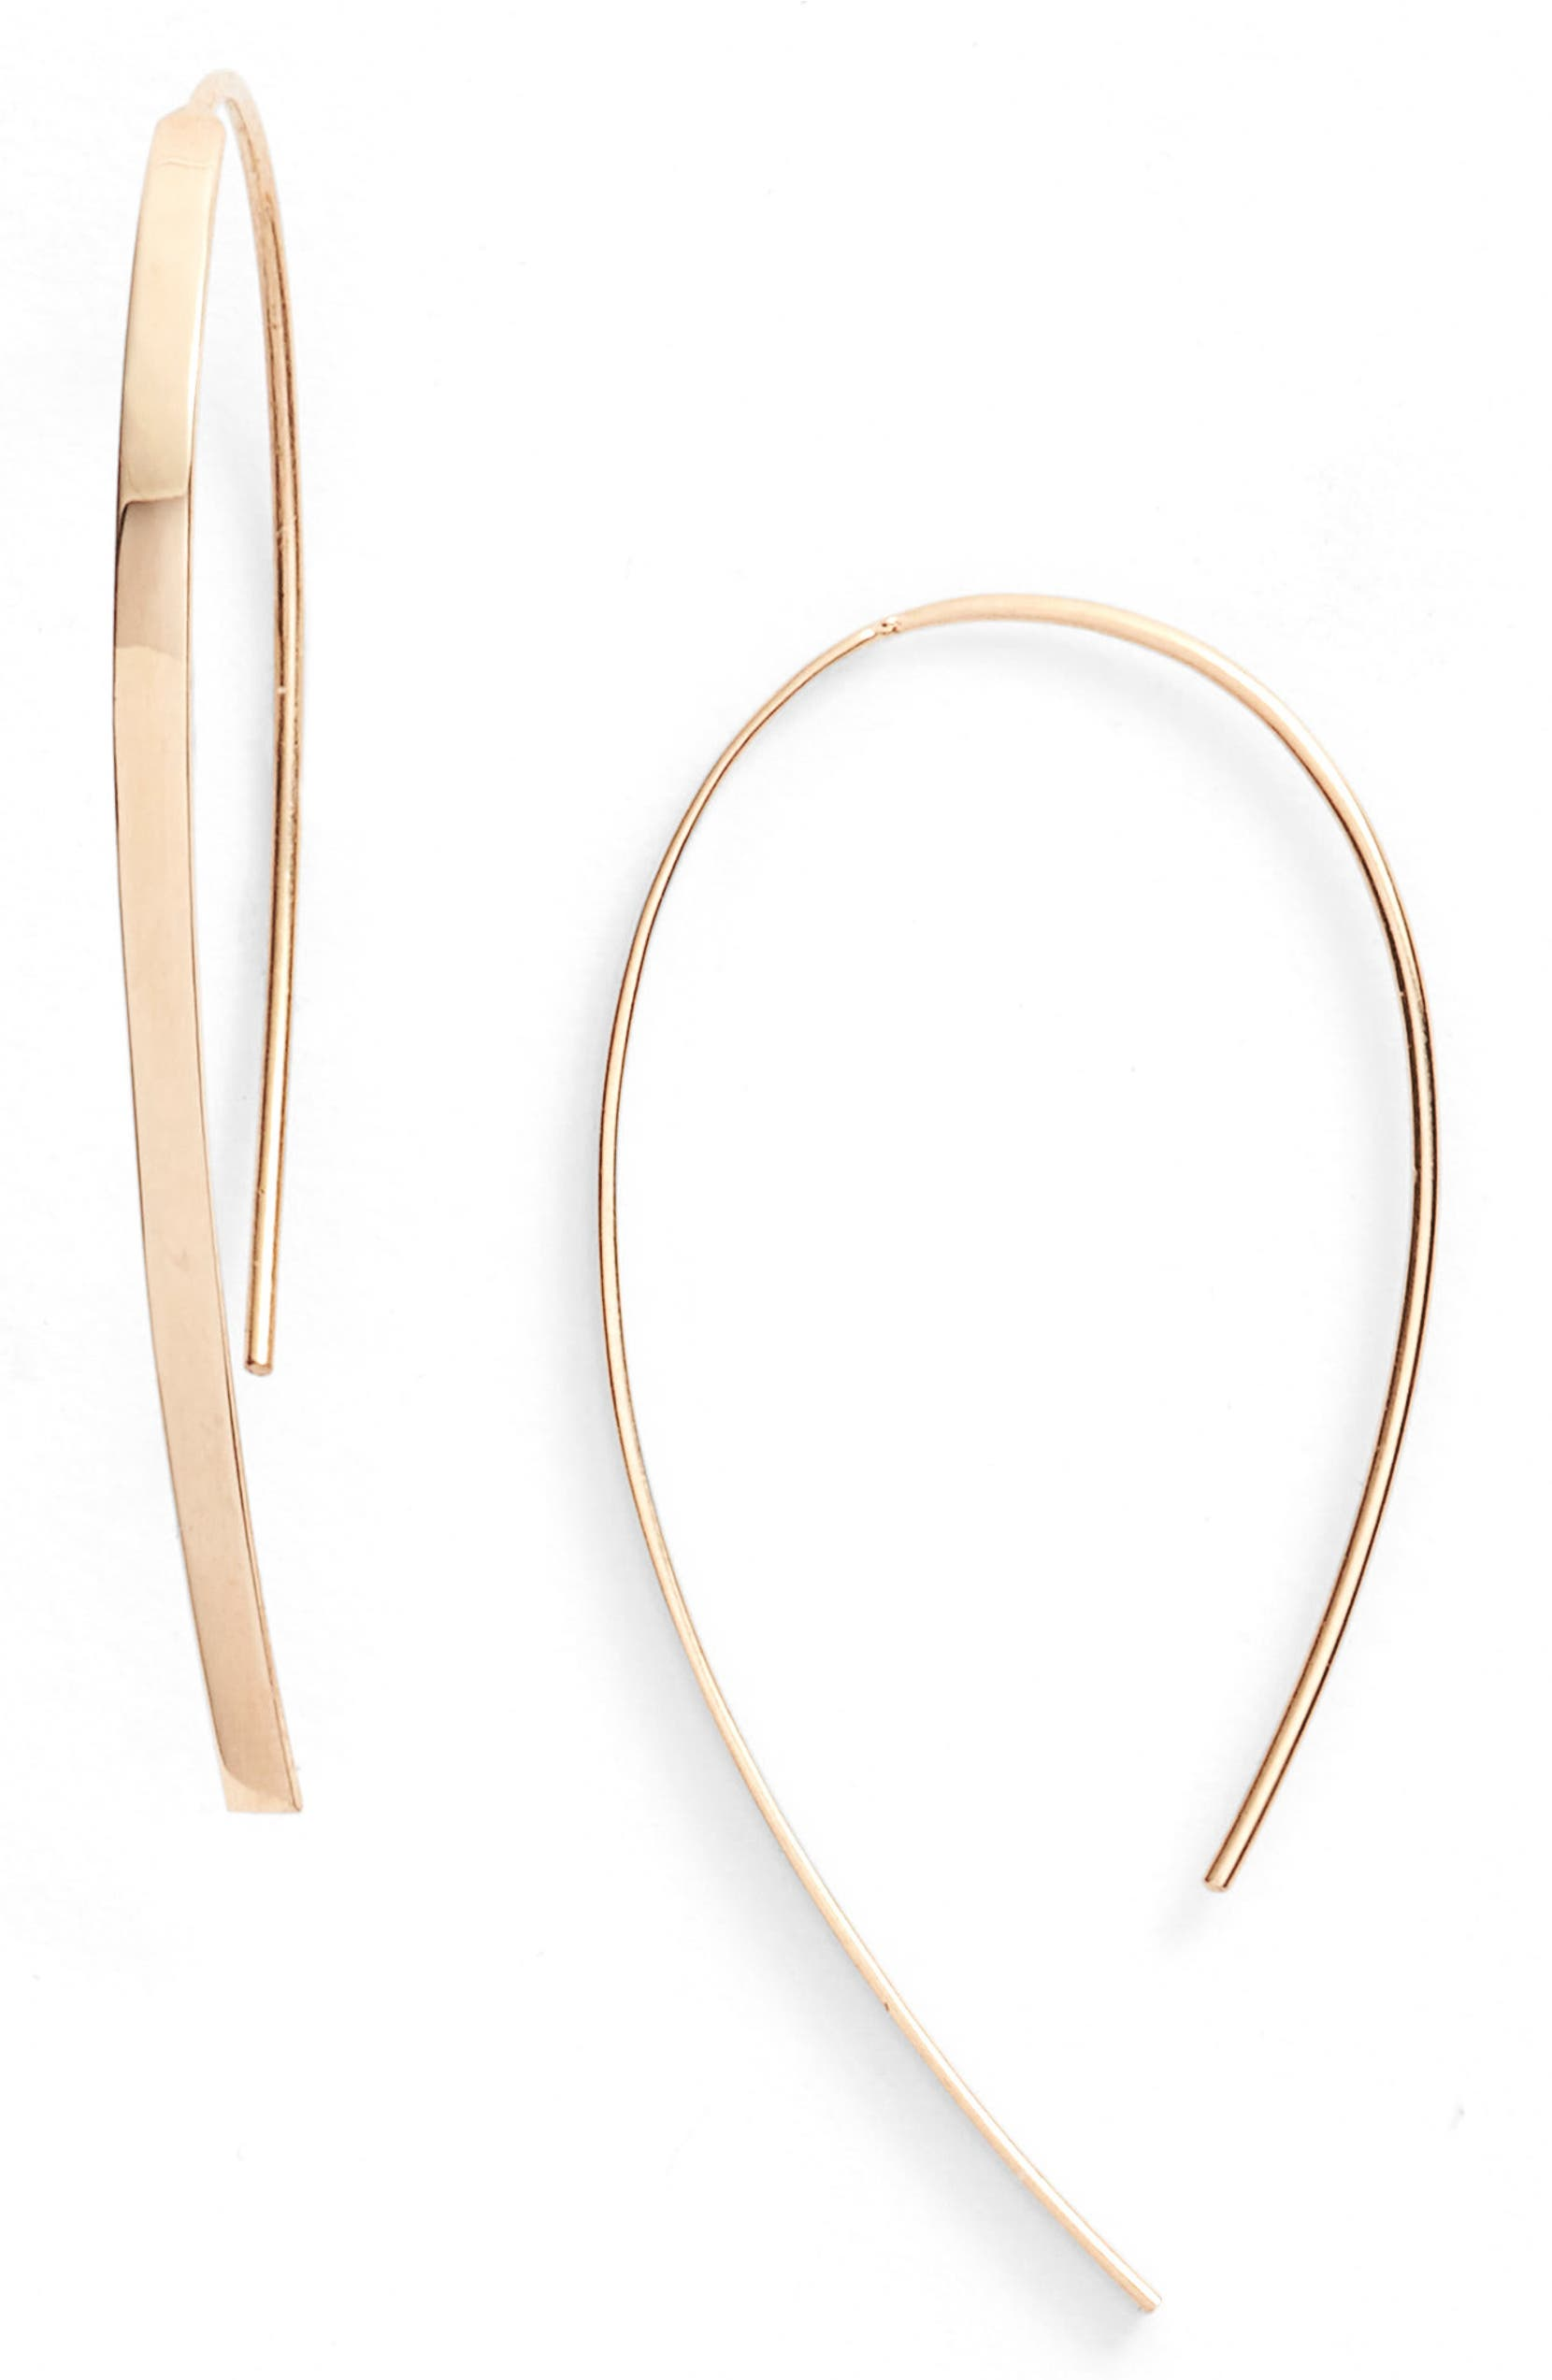 92b8ccac92ce63 Lana Jewelry Mini Flat Hooked On Hoop Earrings | Nordstrom